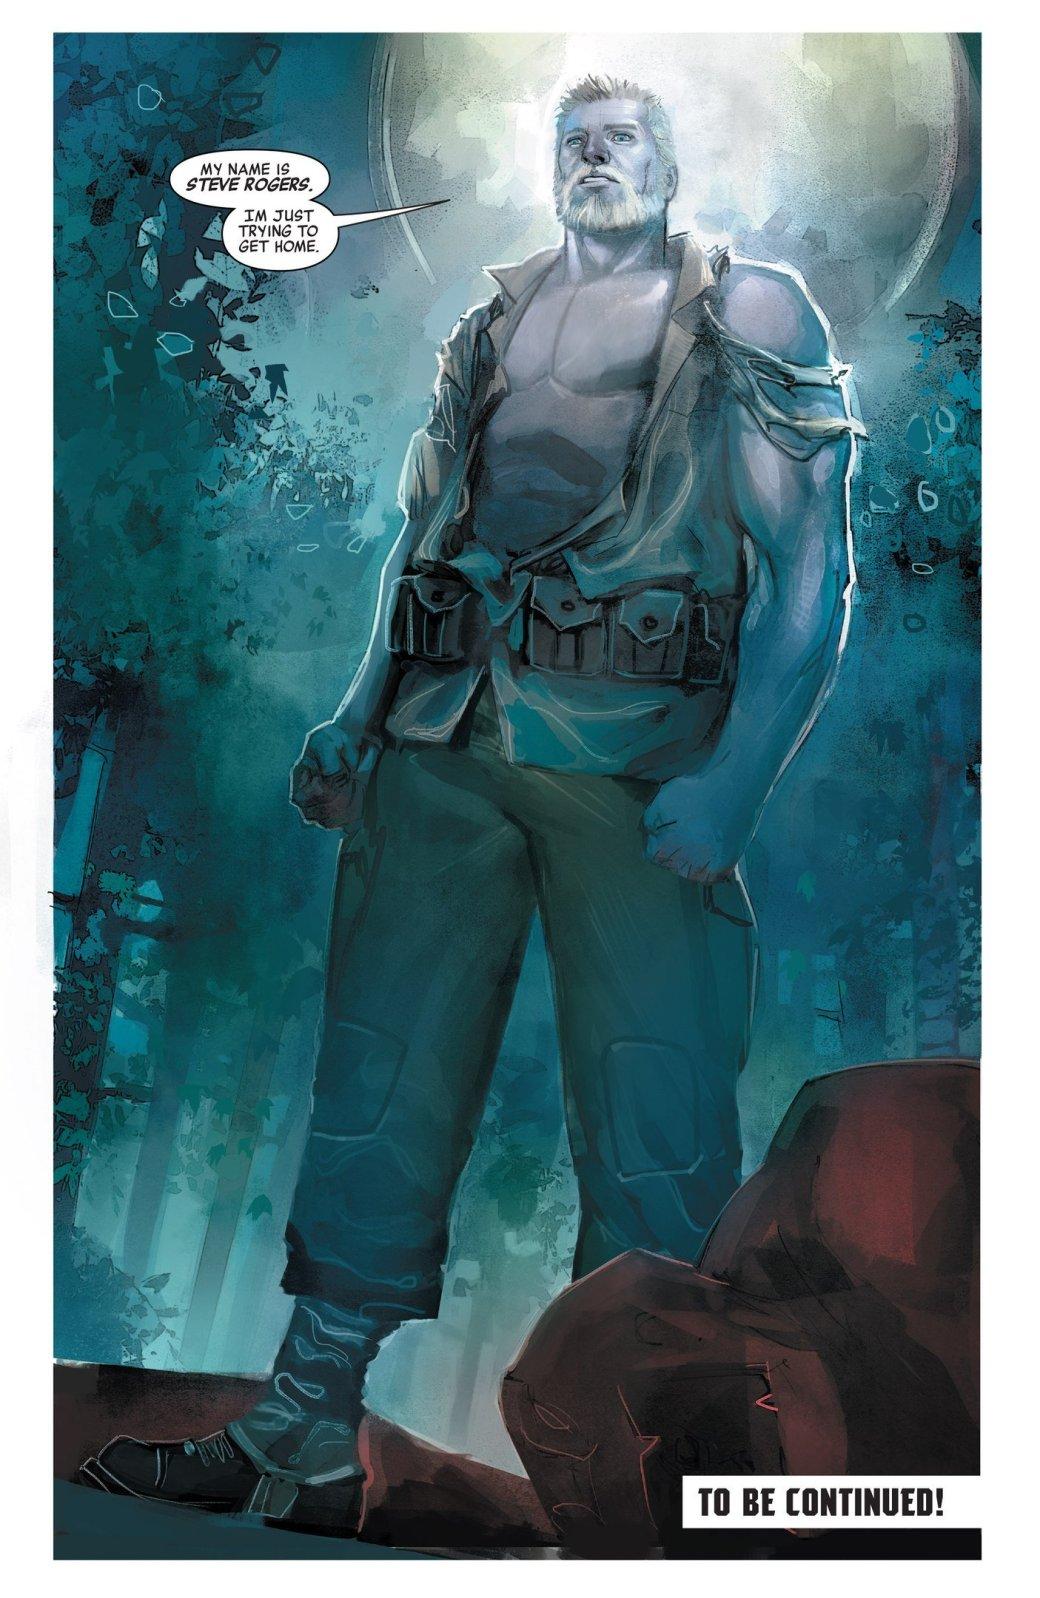 Еще один Капитан Америка в комиксах Marvel? Разбираем фанатские теории - Изображение 1